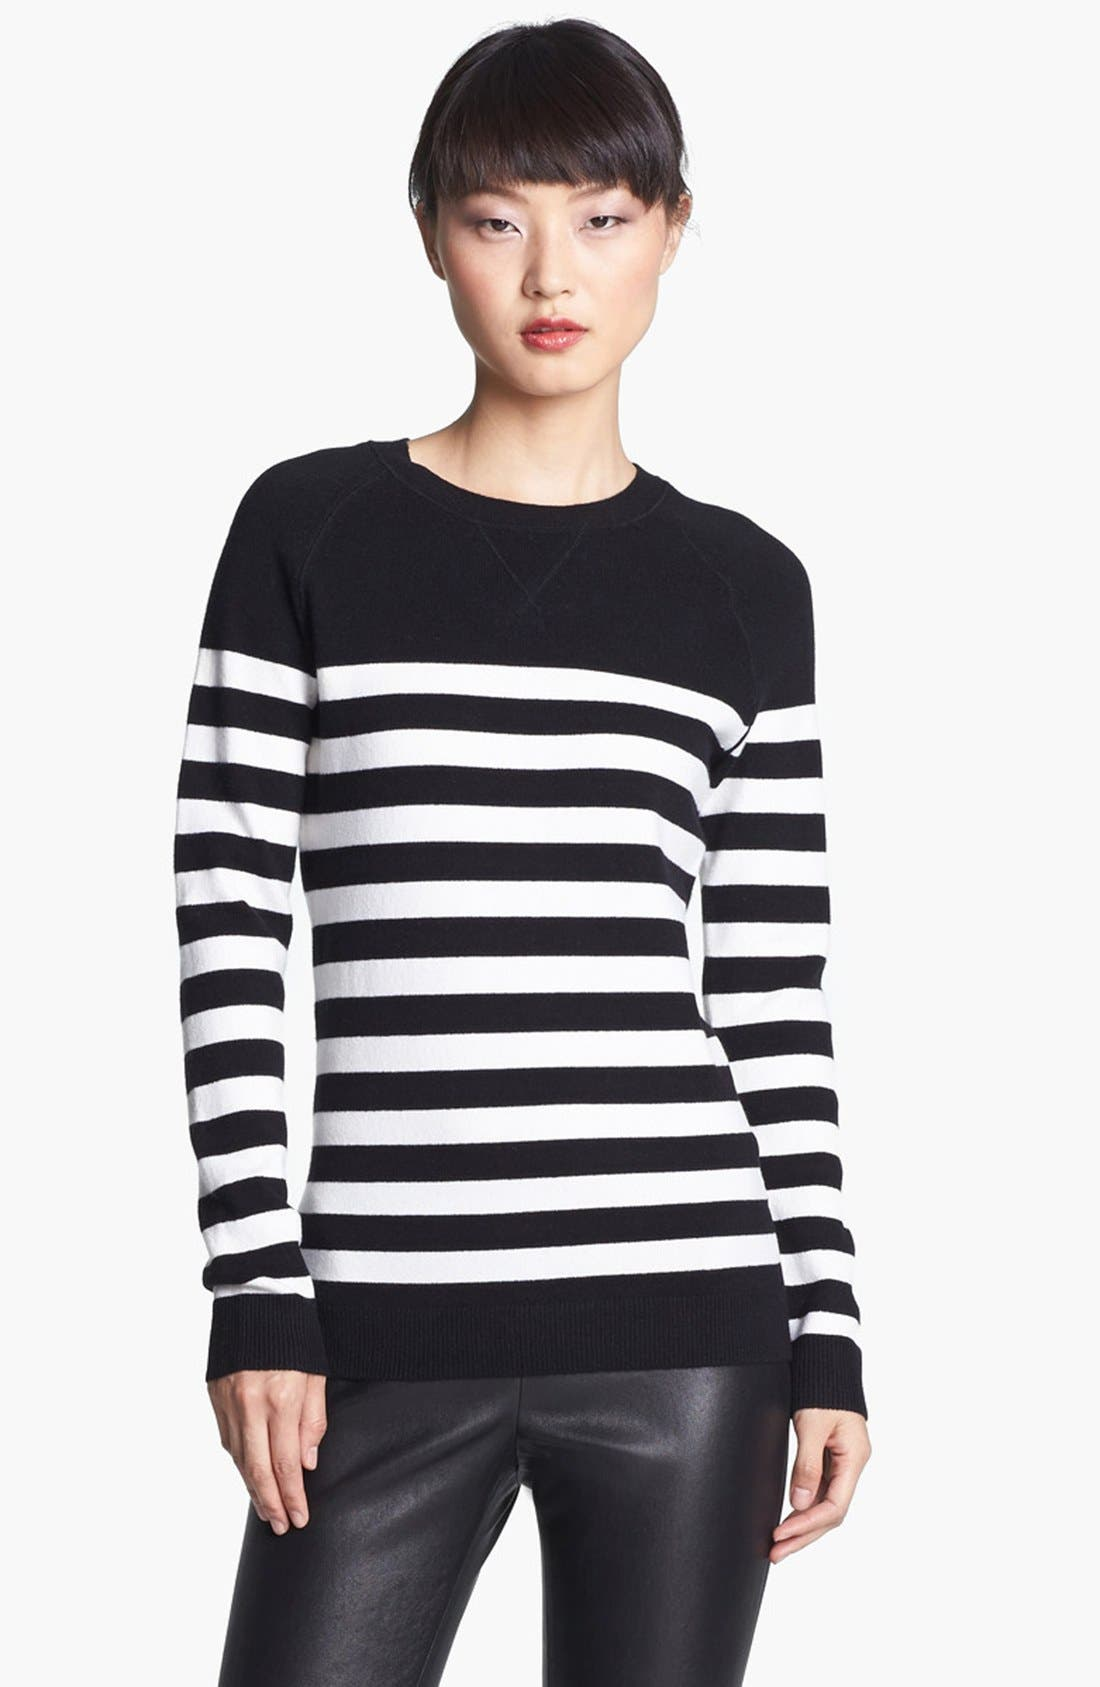 Main Image - Miss Wu 'Zucca' Stripe Cashmere Blend Sweater (Nordstrom Exclusive)